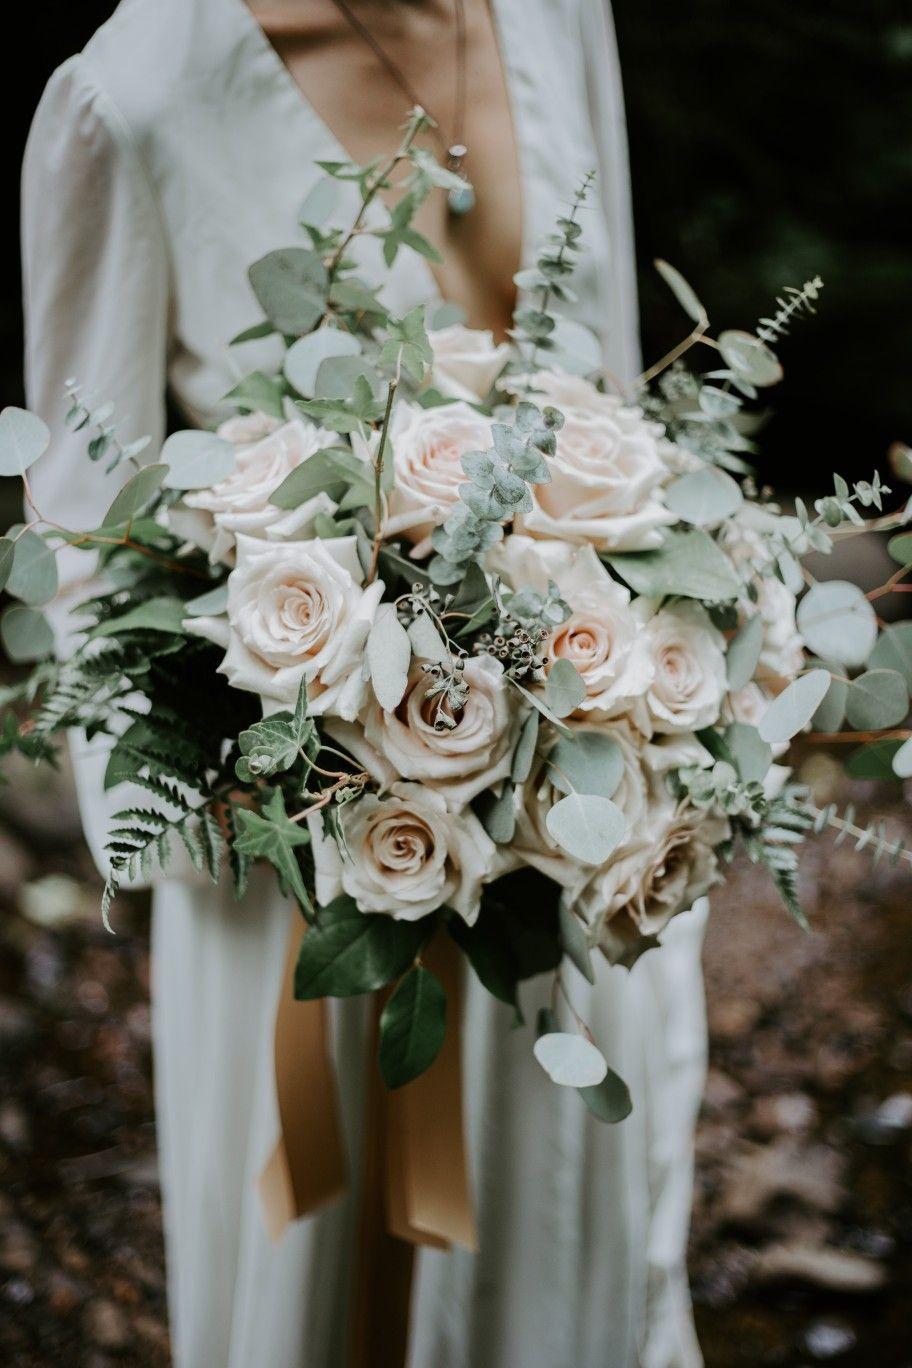 Beautiful Quicksand Blush Roses With Spiral Eucalyptus Seeded Eucalyptus Silver Dollar Euca Purple Bridal Bouquet Blush Bridal Bouquet Flower Bouquet Wedding